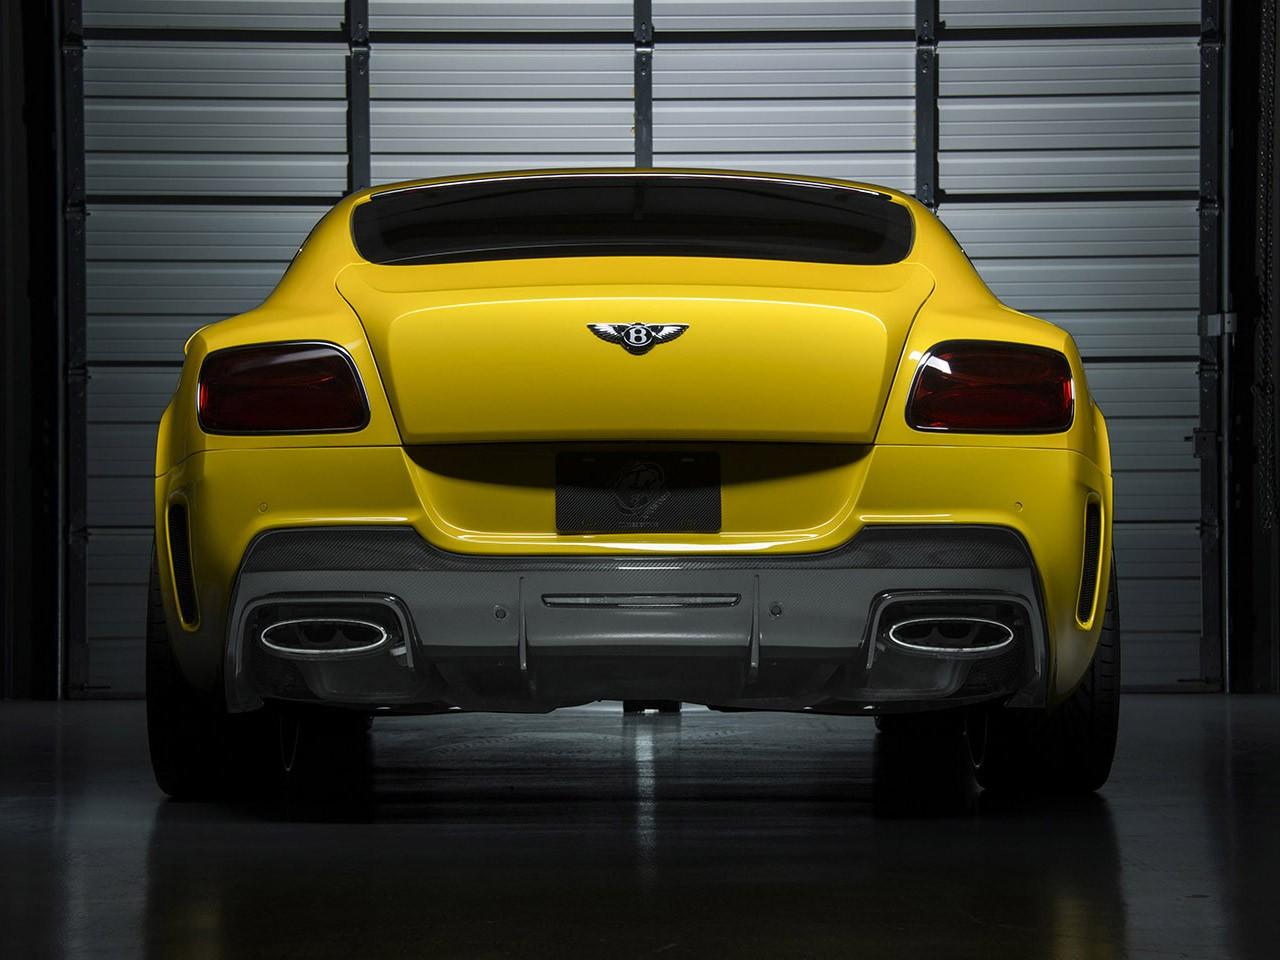 2015 Vorsteiner - Bentley Continental GT BR10 RS